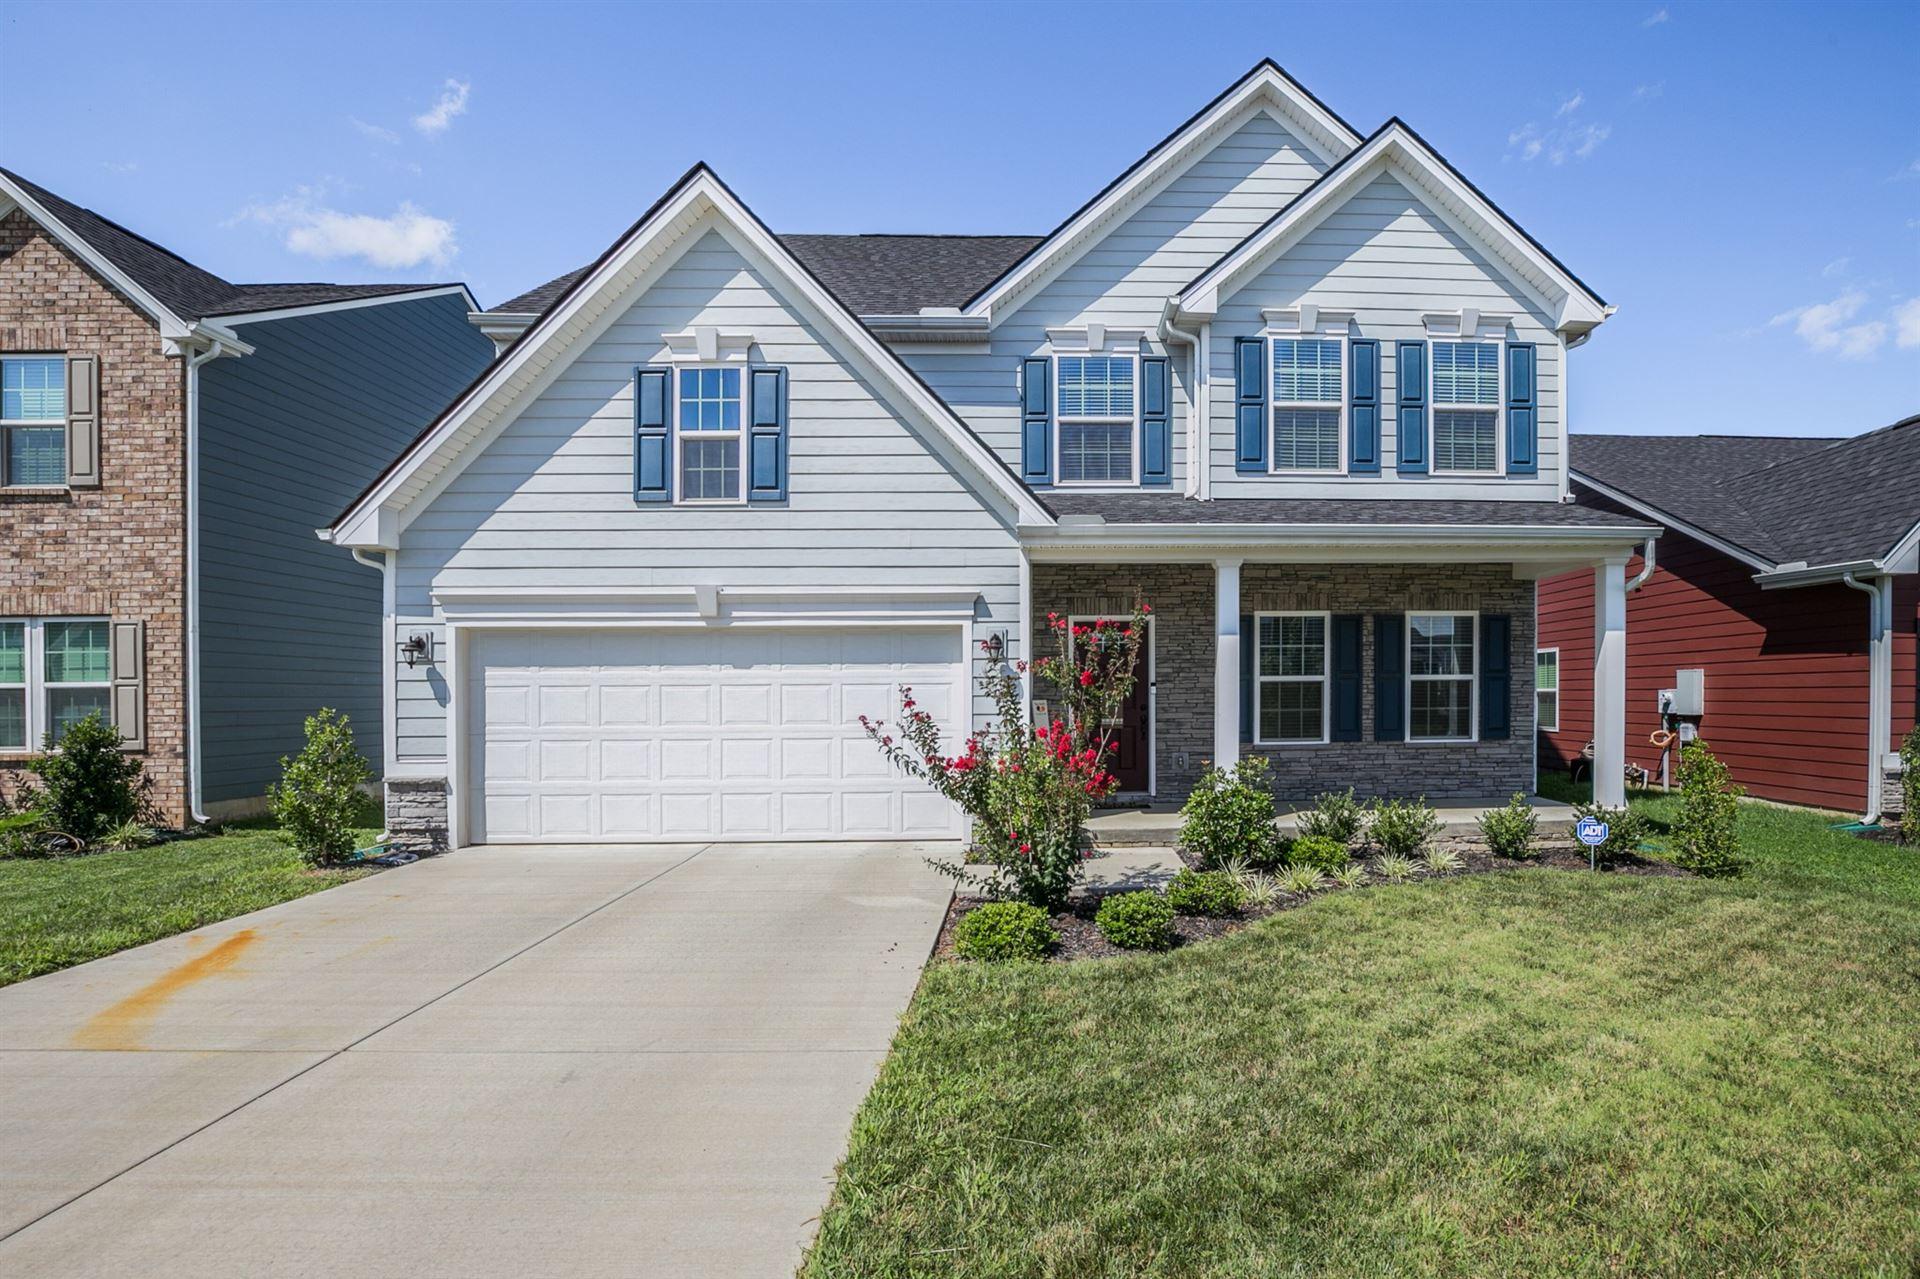 2918 Leipers Fork Trl, Murfreesboro, TN 37128 - MLS#: 2176262